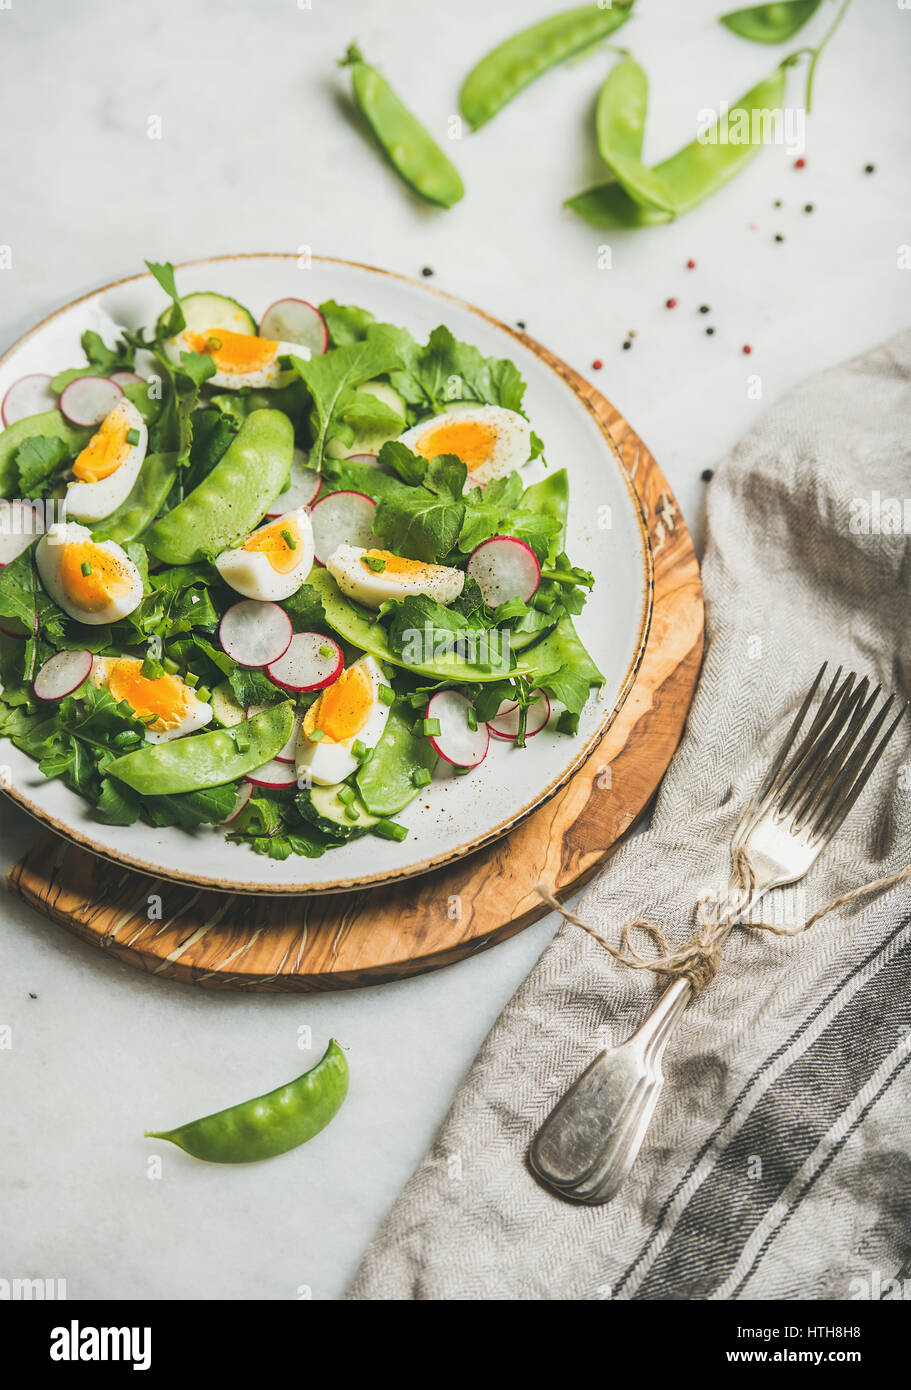 Healthy salad with radish, boiled egg, arugula, green pea, mint - Stock Image